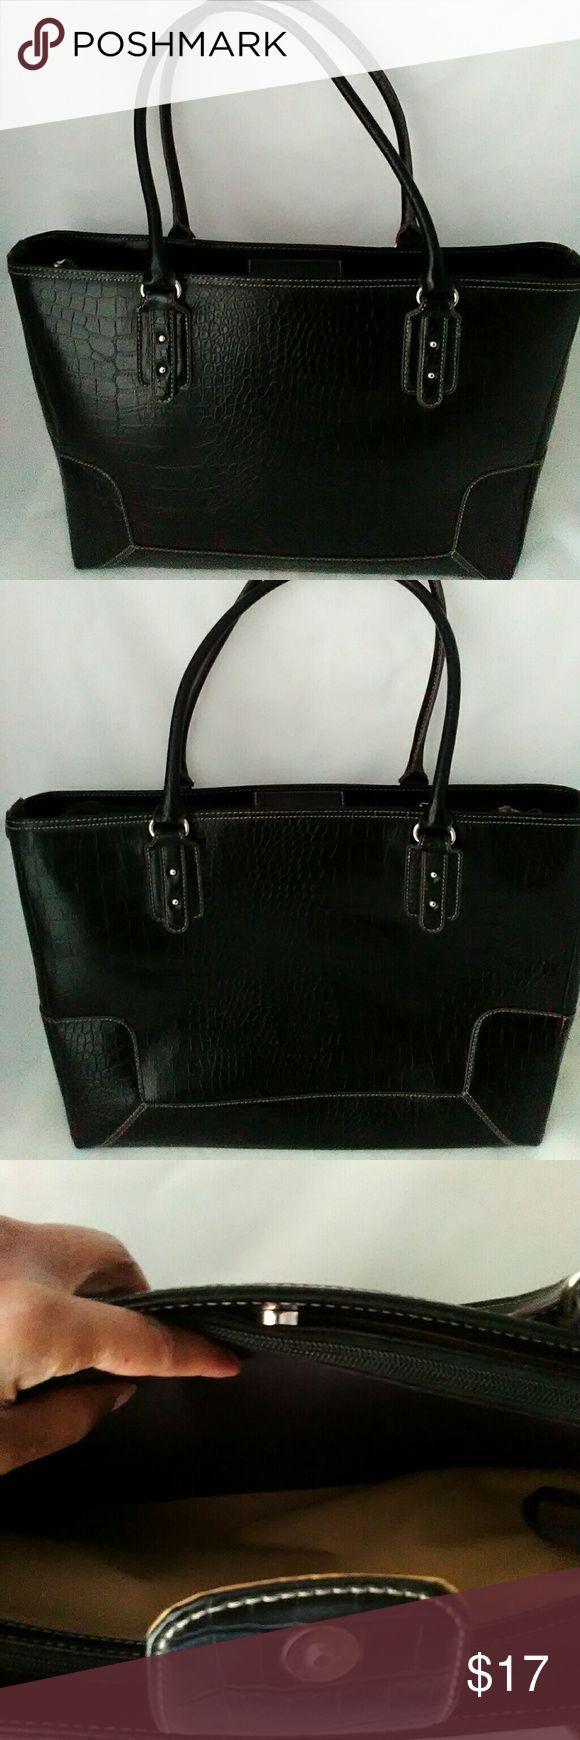 Apostrophe black laptop case tote bag Apostrophe black laptop tote bag case Bags Laptop Bags